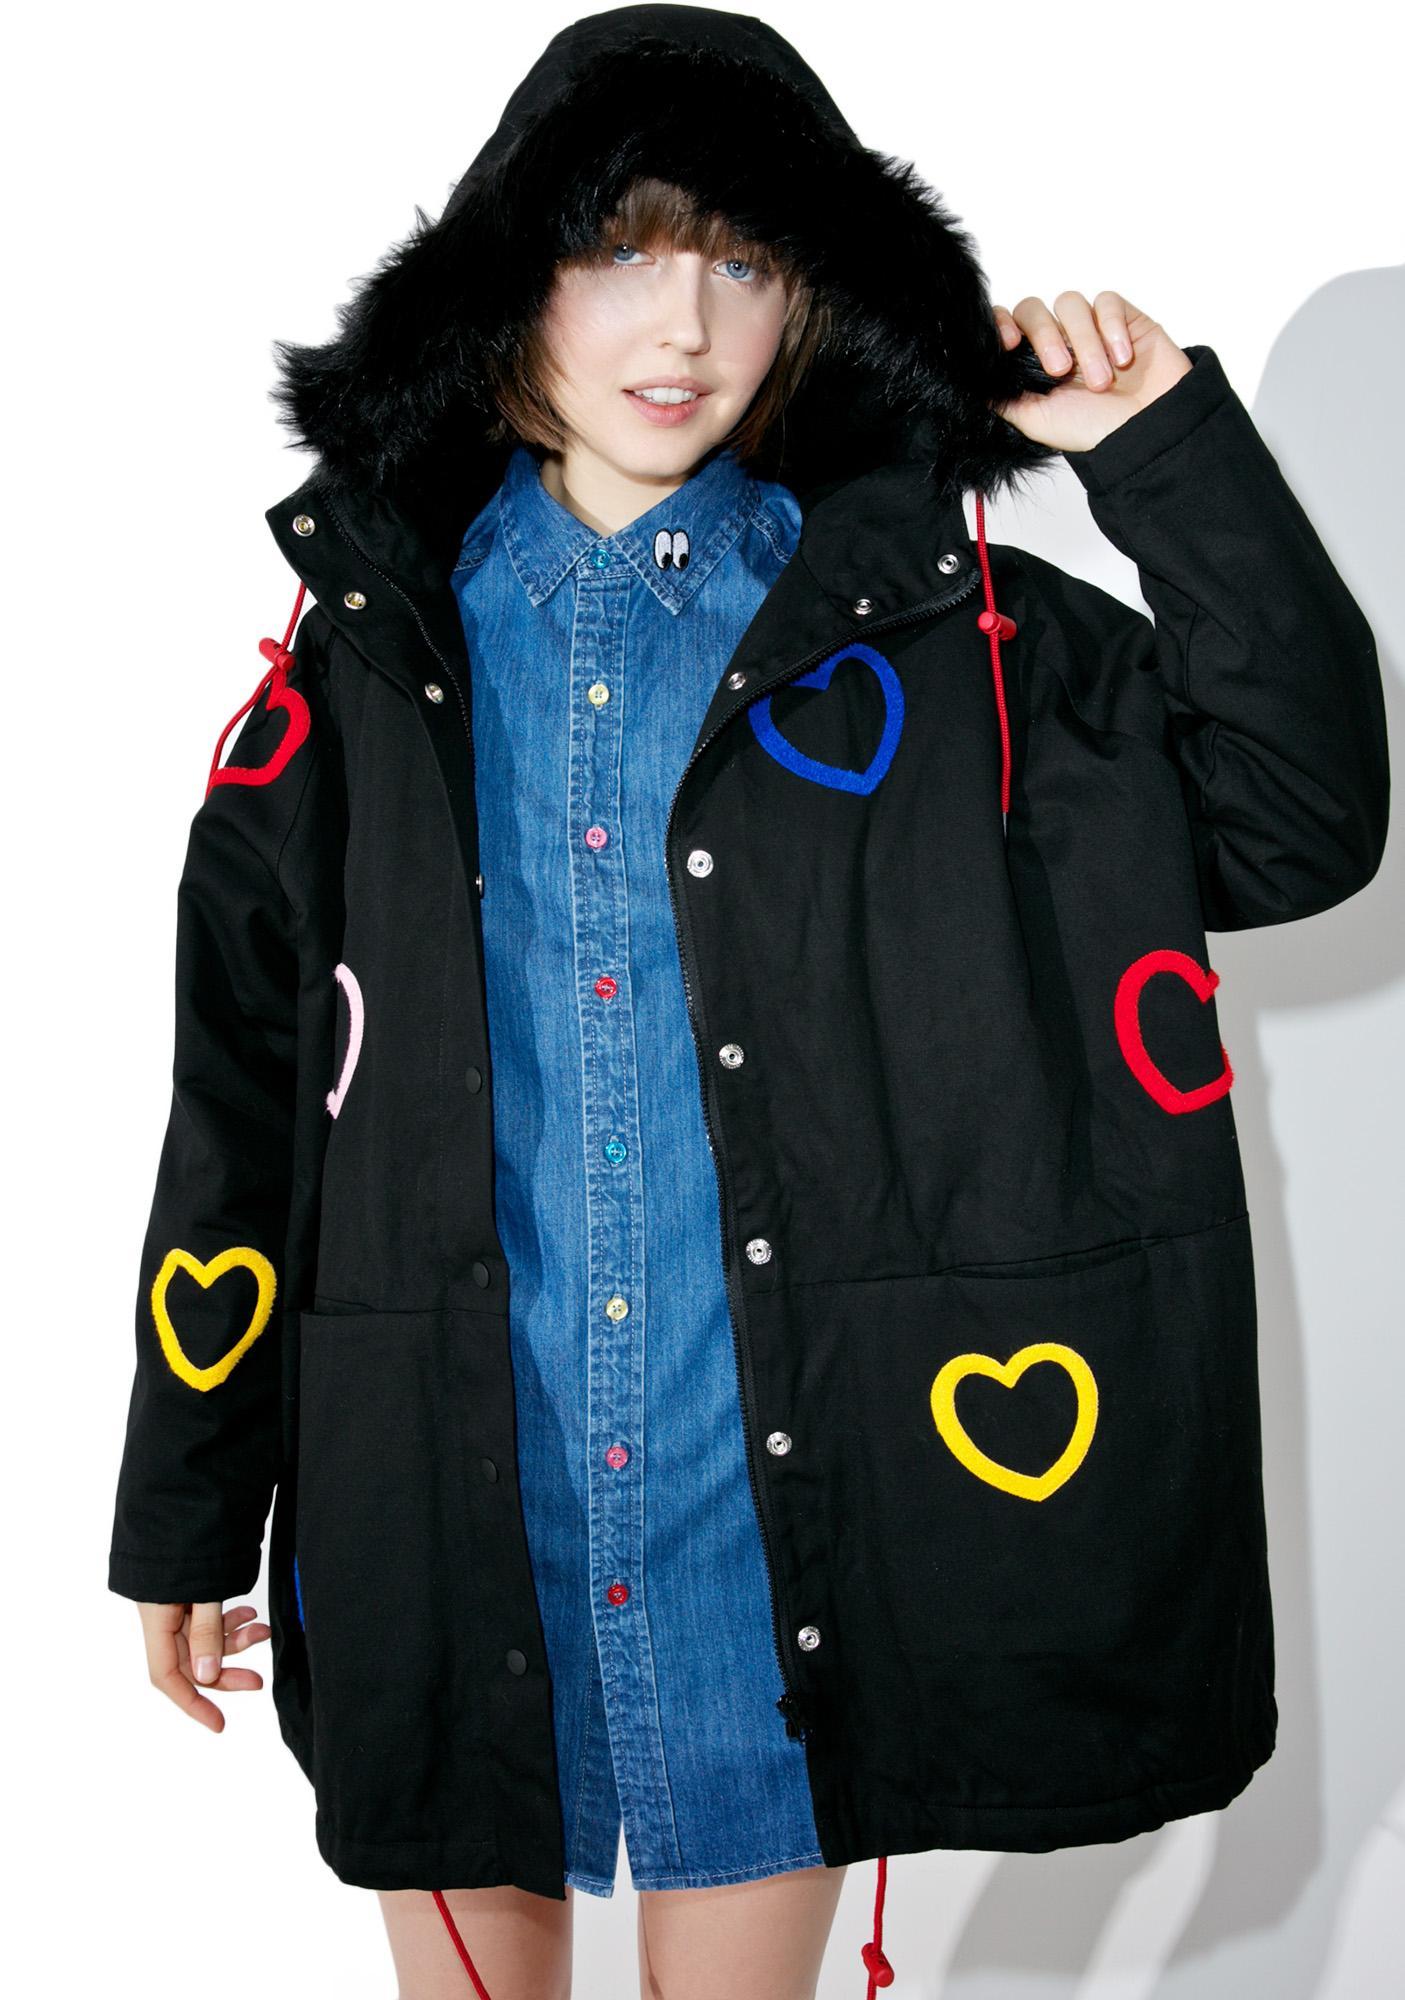 Lazy Oaf Heart Collection Jacket